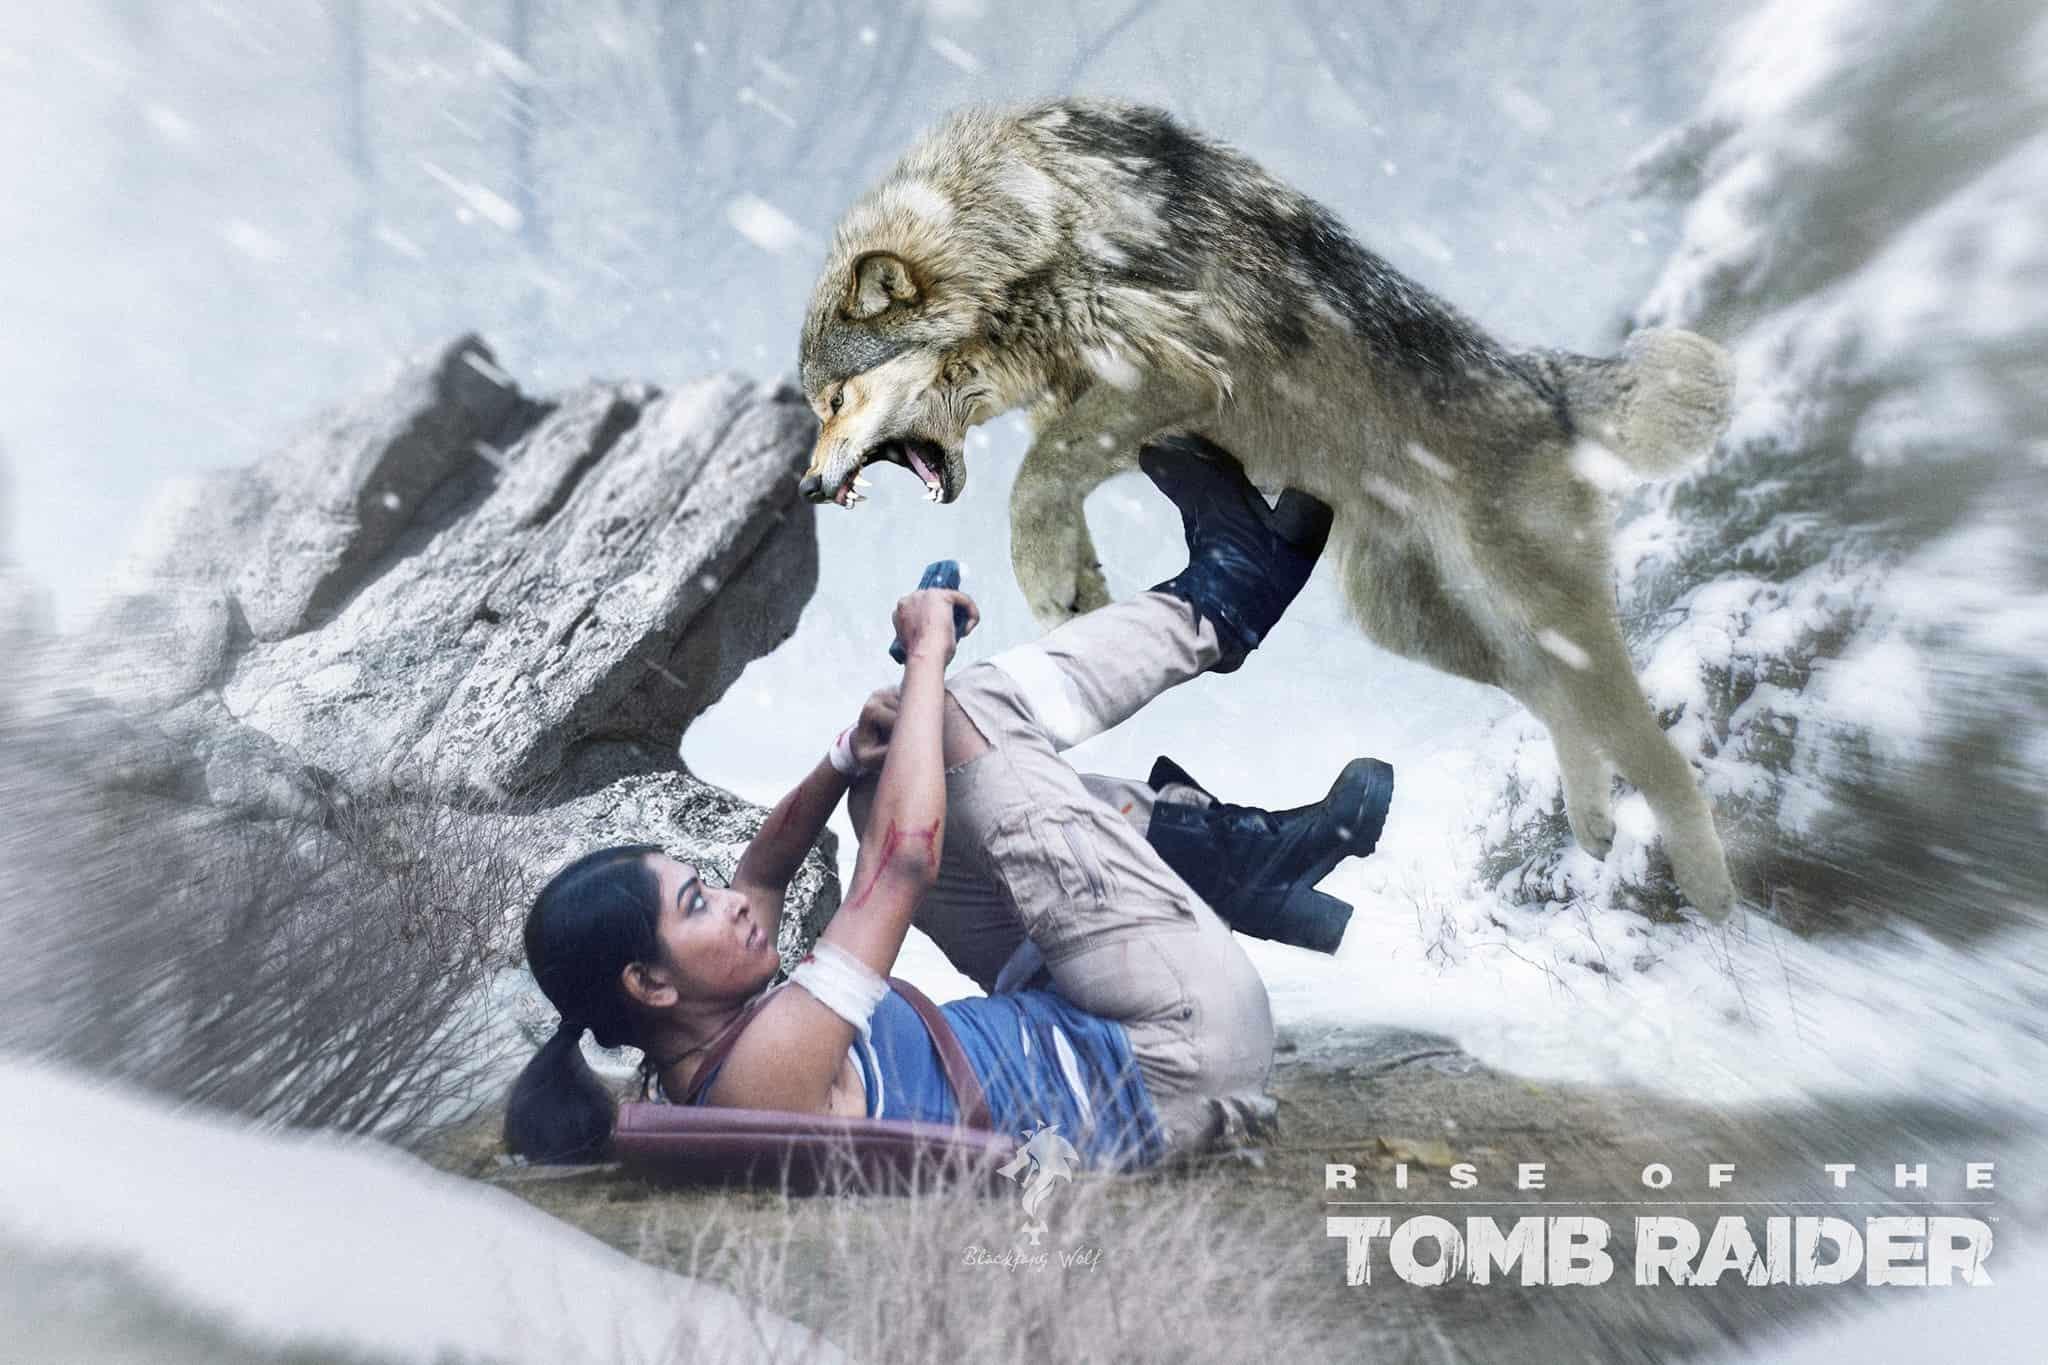 Lara-Croft-Tomb-Raider-Akanksha